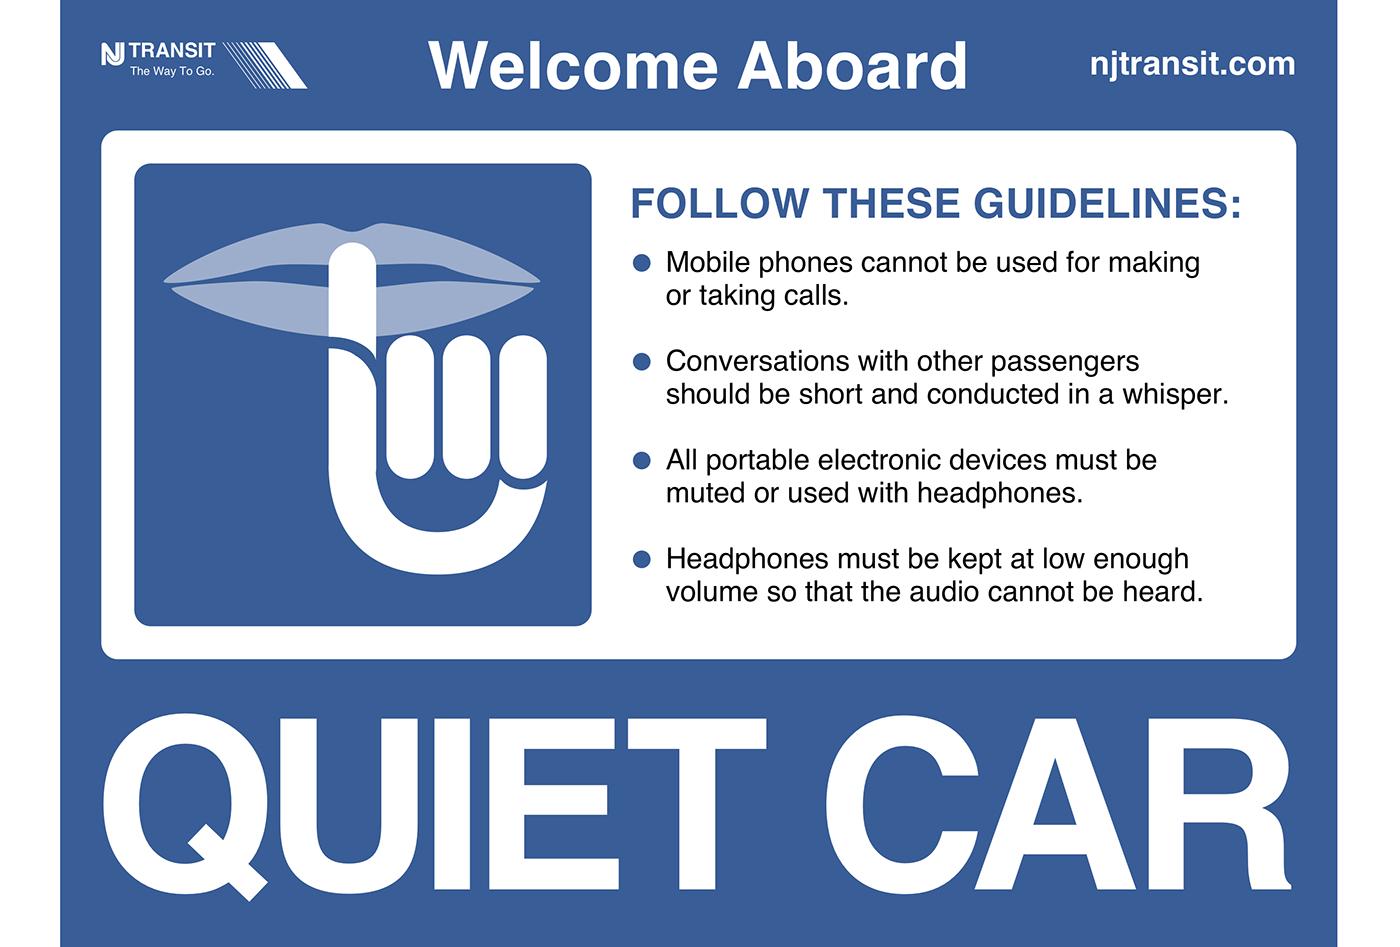 NJ TRANSIT NJT sketch quiet car train